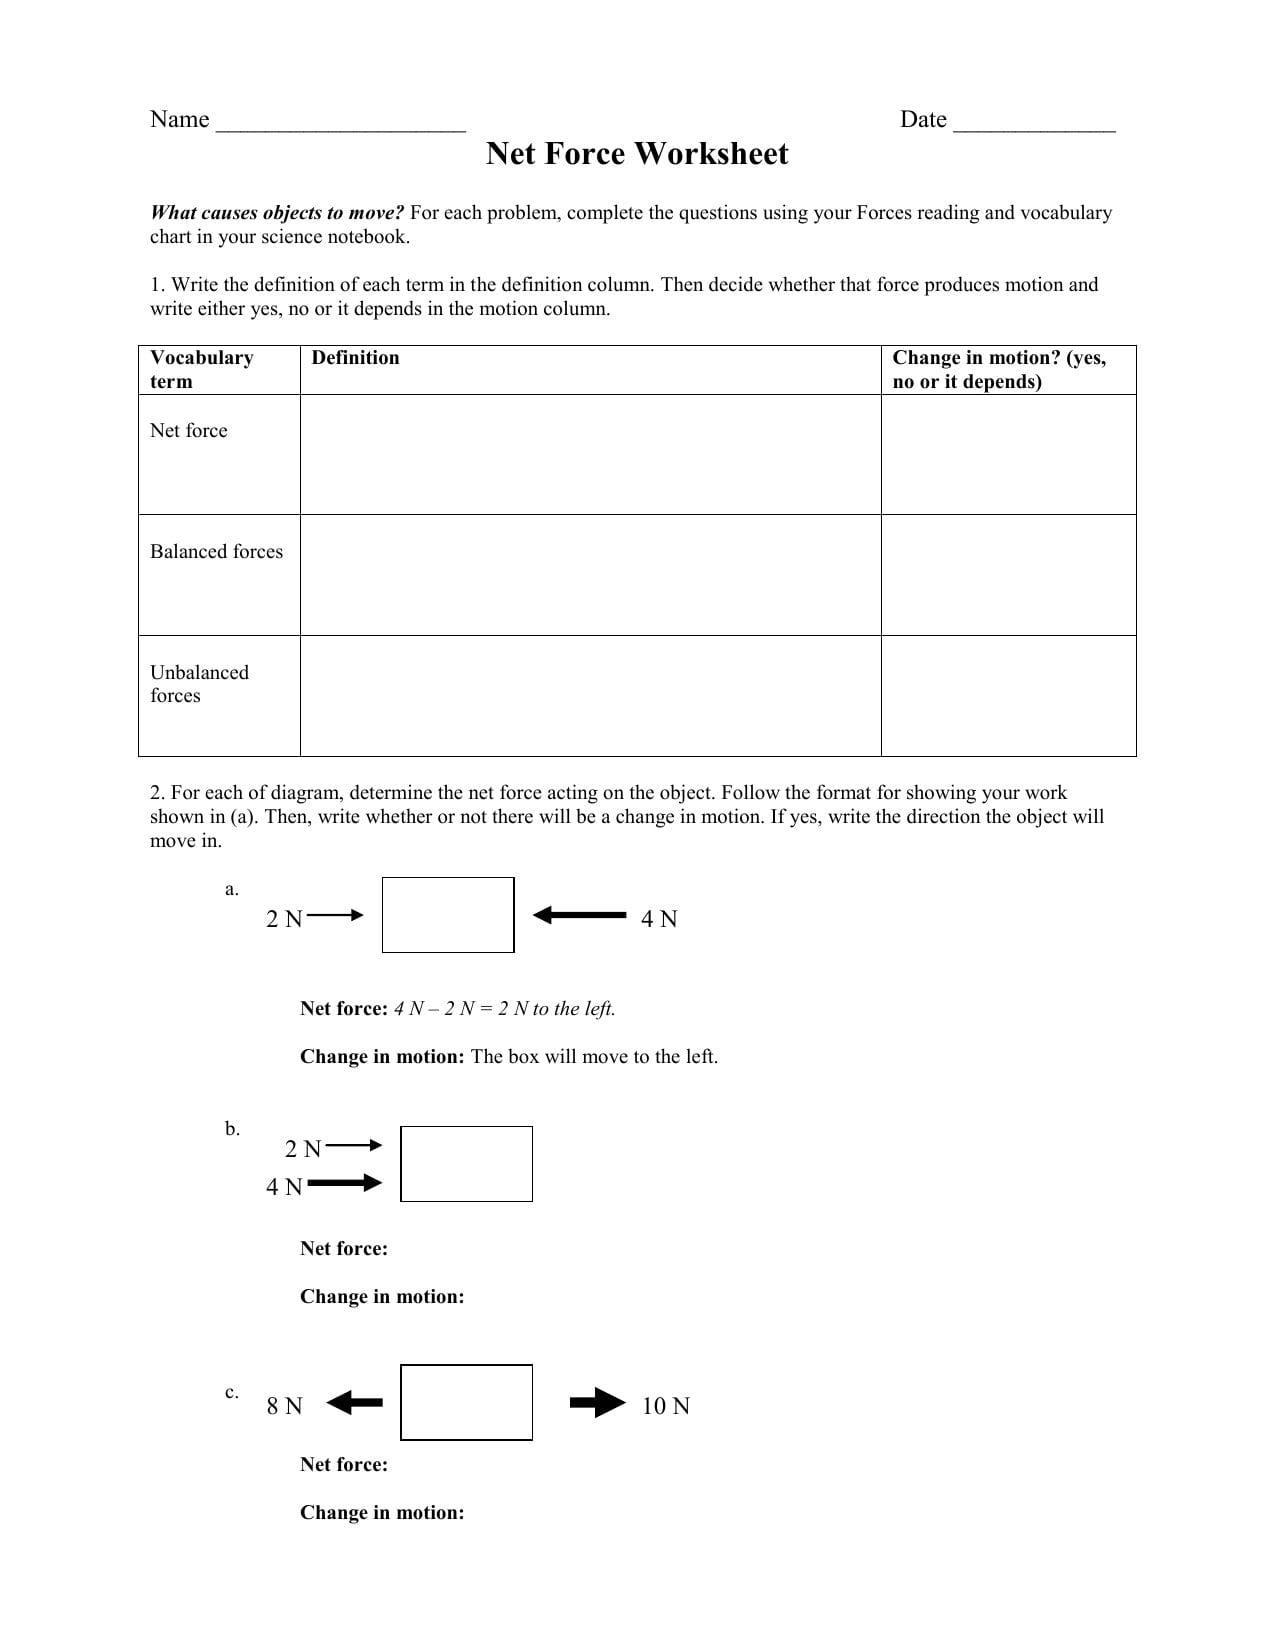 Net Force Worksheet Answer Key